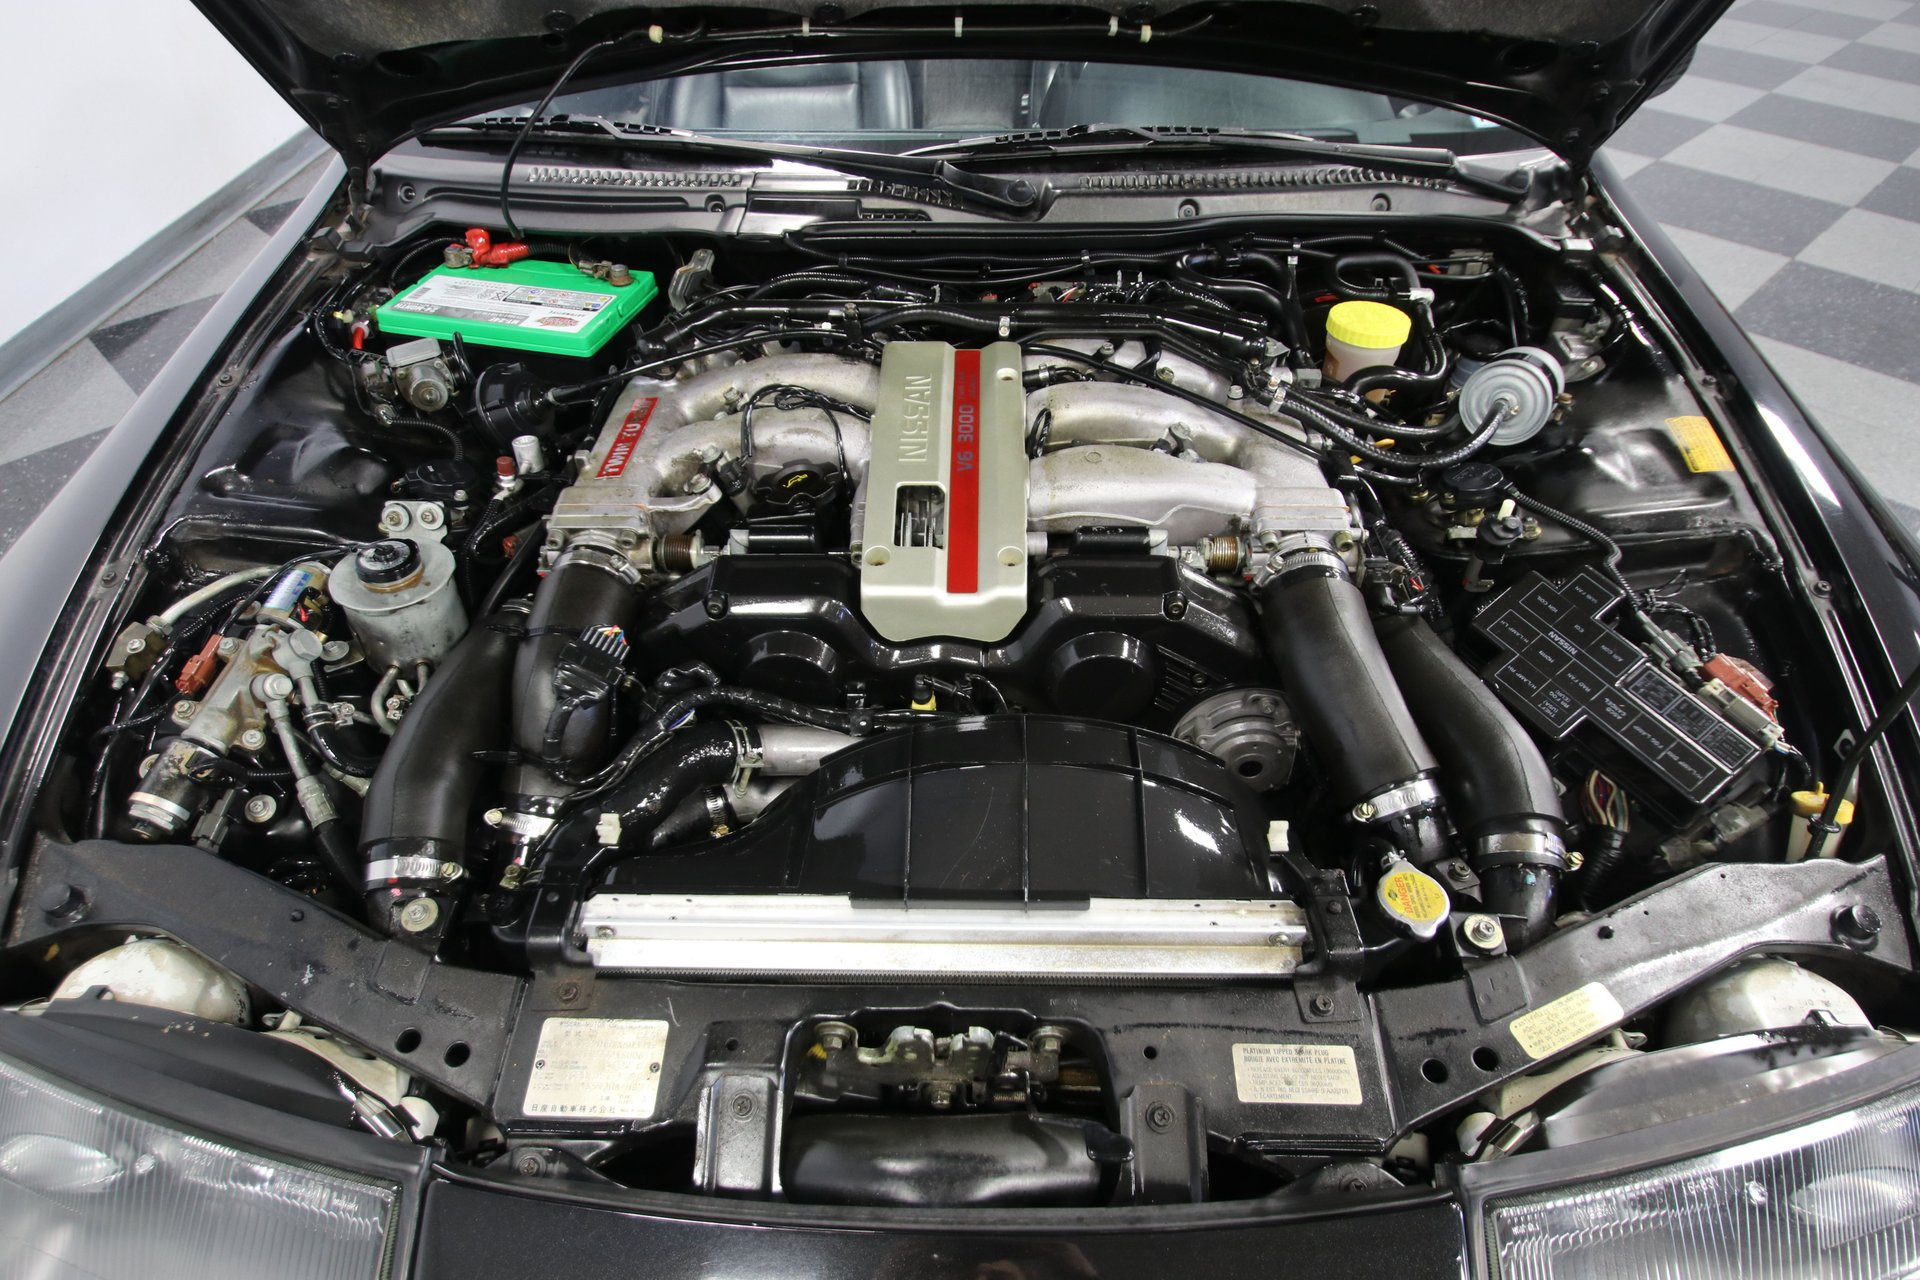 1991 nissan 300zx twin turbo